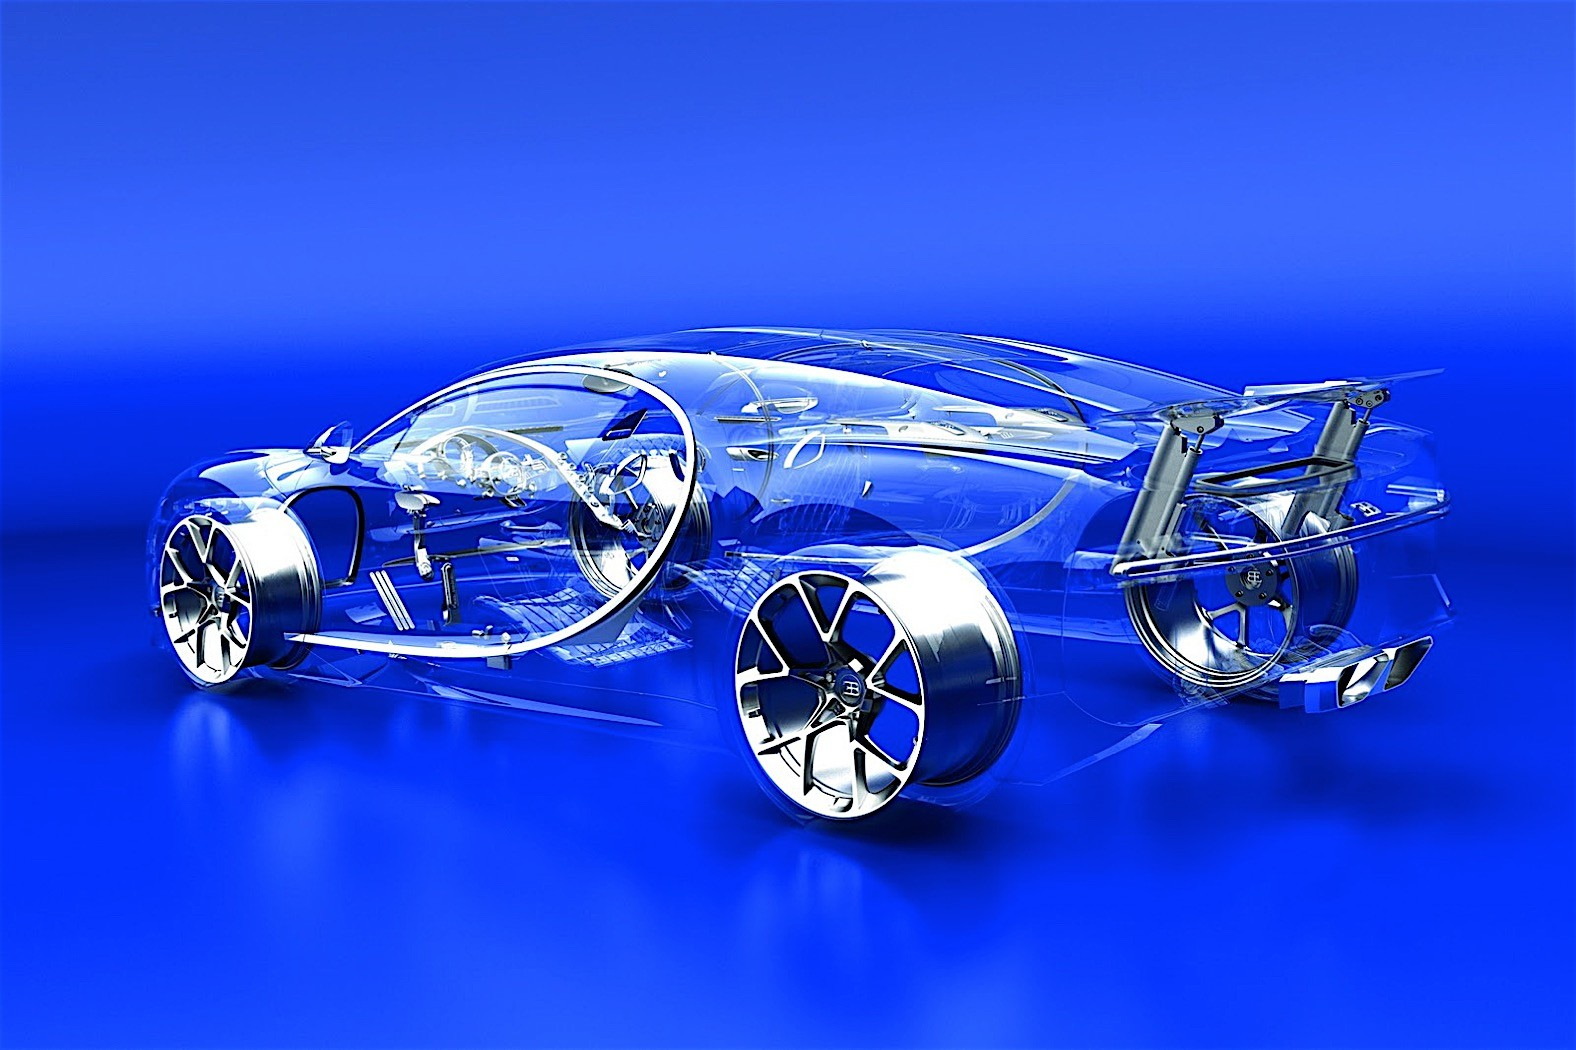 Bugatti Admits Targeting New Sd Record With Chiron, Water Is ... on orange subaru, orange tesla, orange gmc, orange mercedes, orange mazda, orange and black veyron vitesse, orange agera, orange saturn, orange alfa romeo, orange vw, orange hyundai,